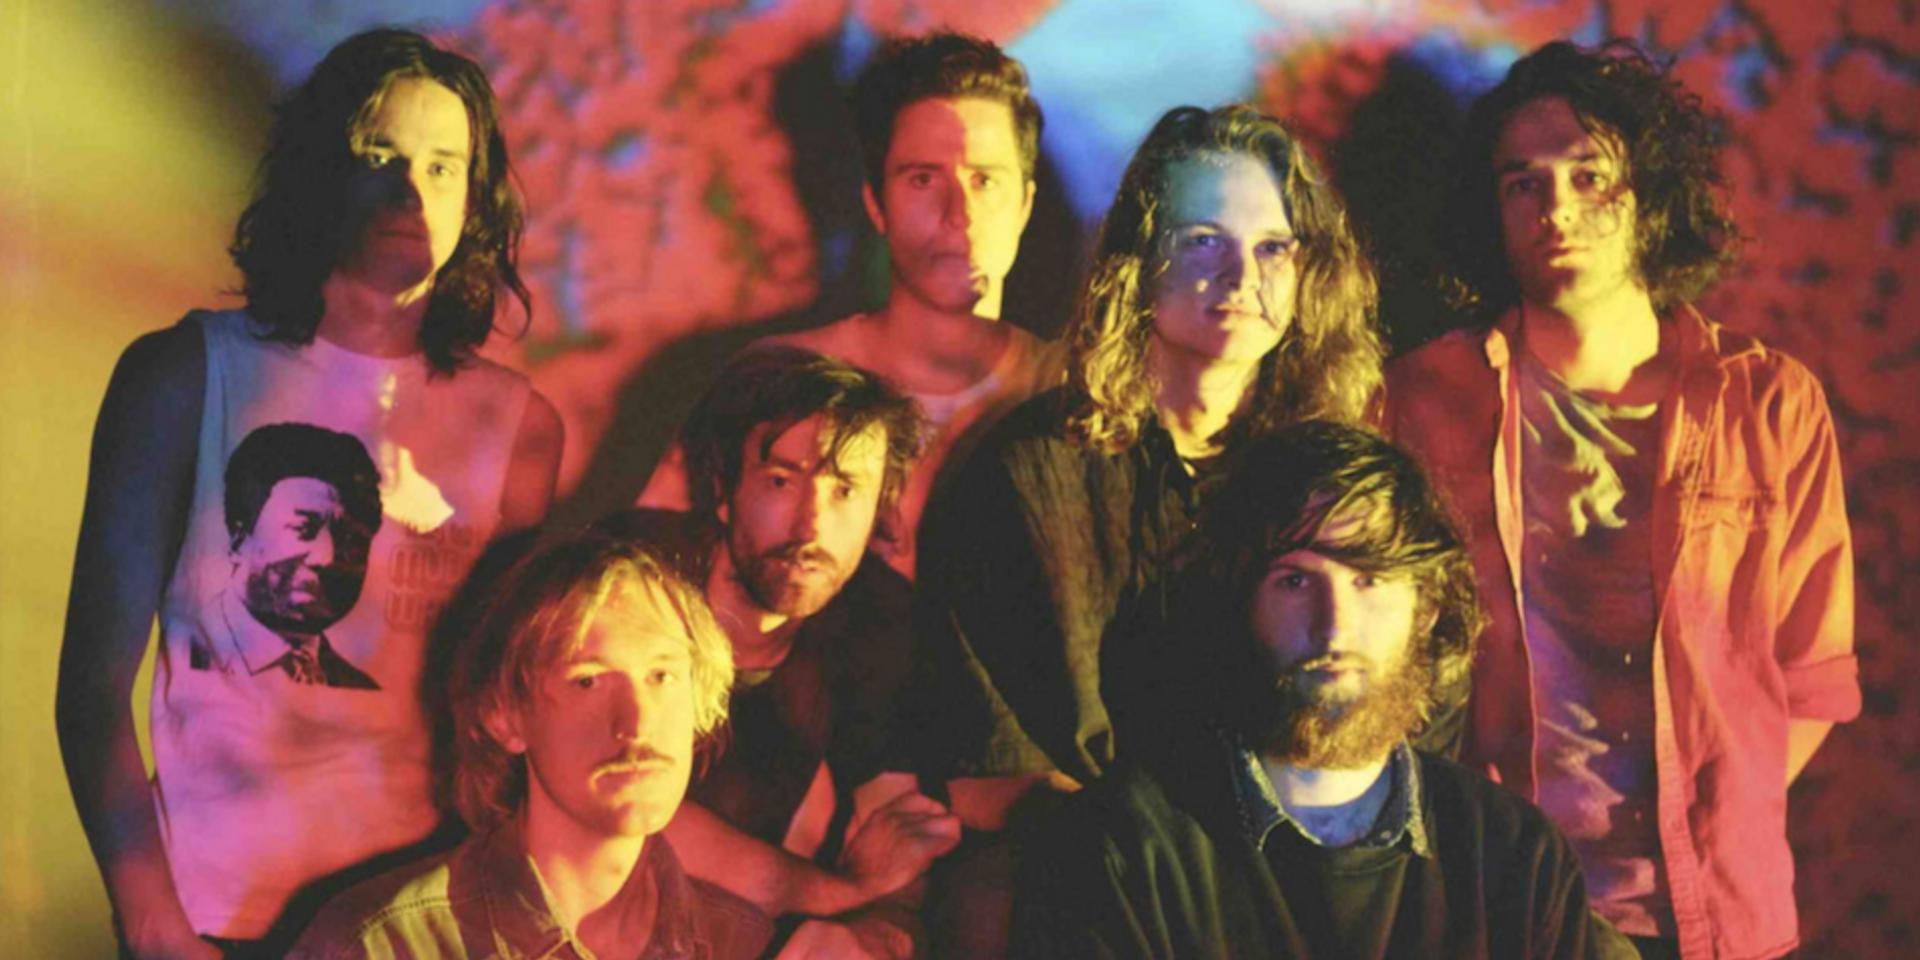 King Gizzard & The Lizard Wizard release new album, Infest the Rats' Nest – listen